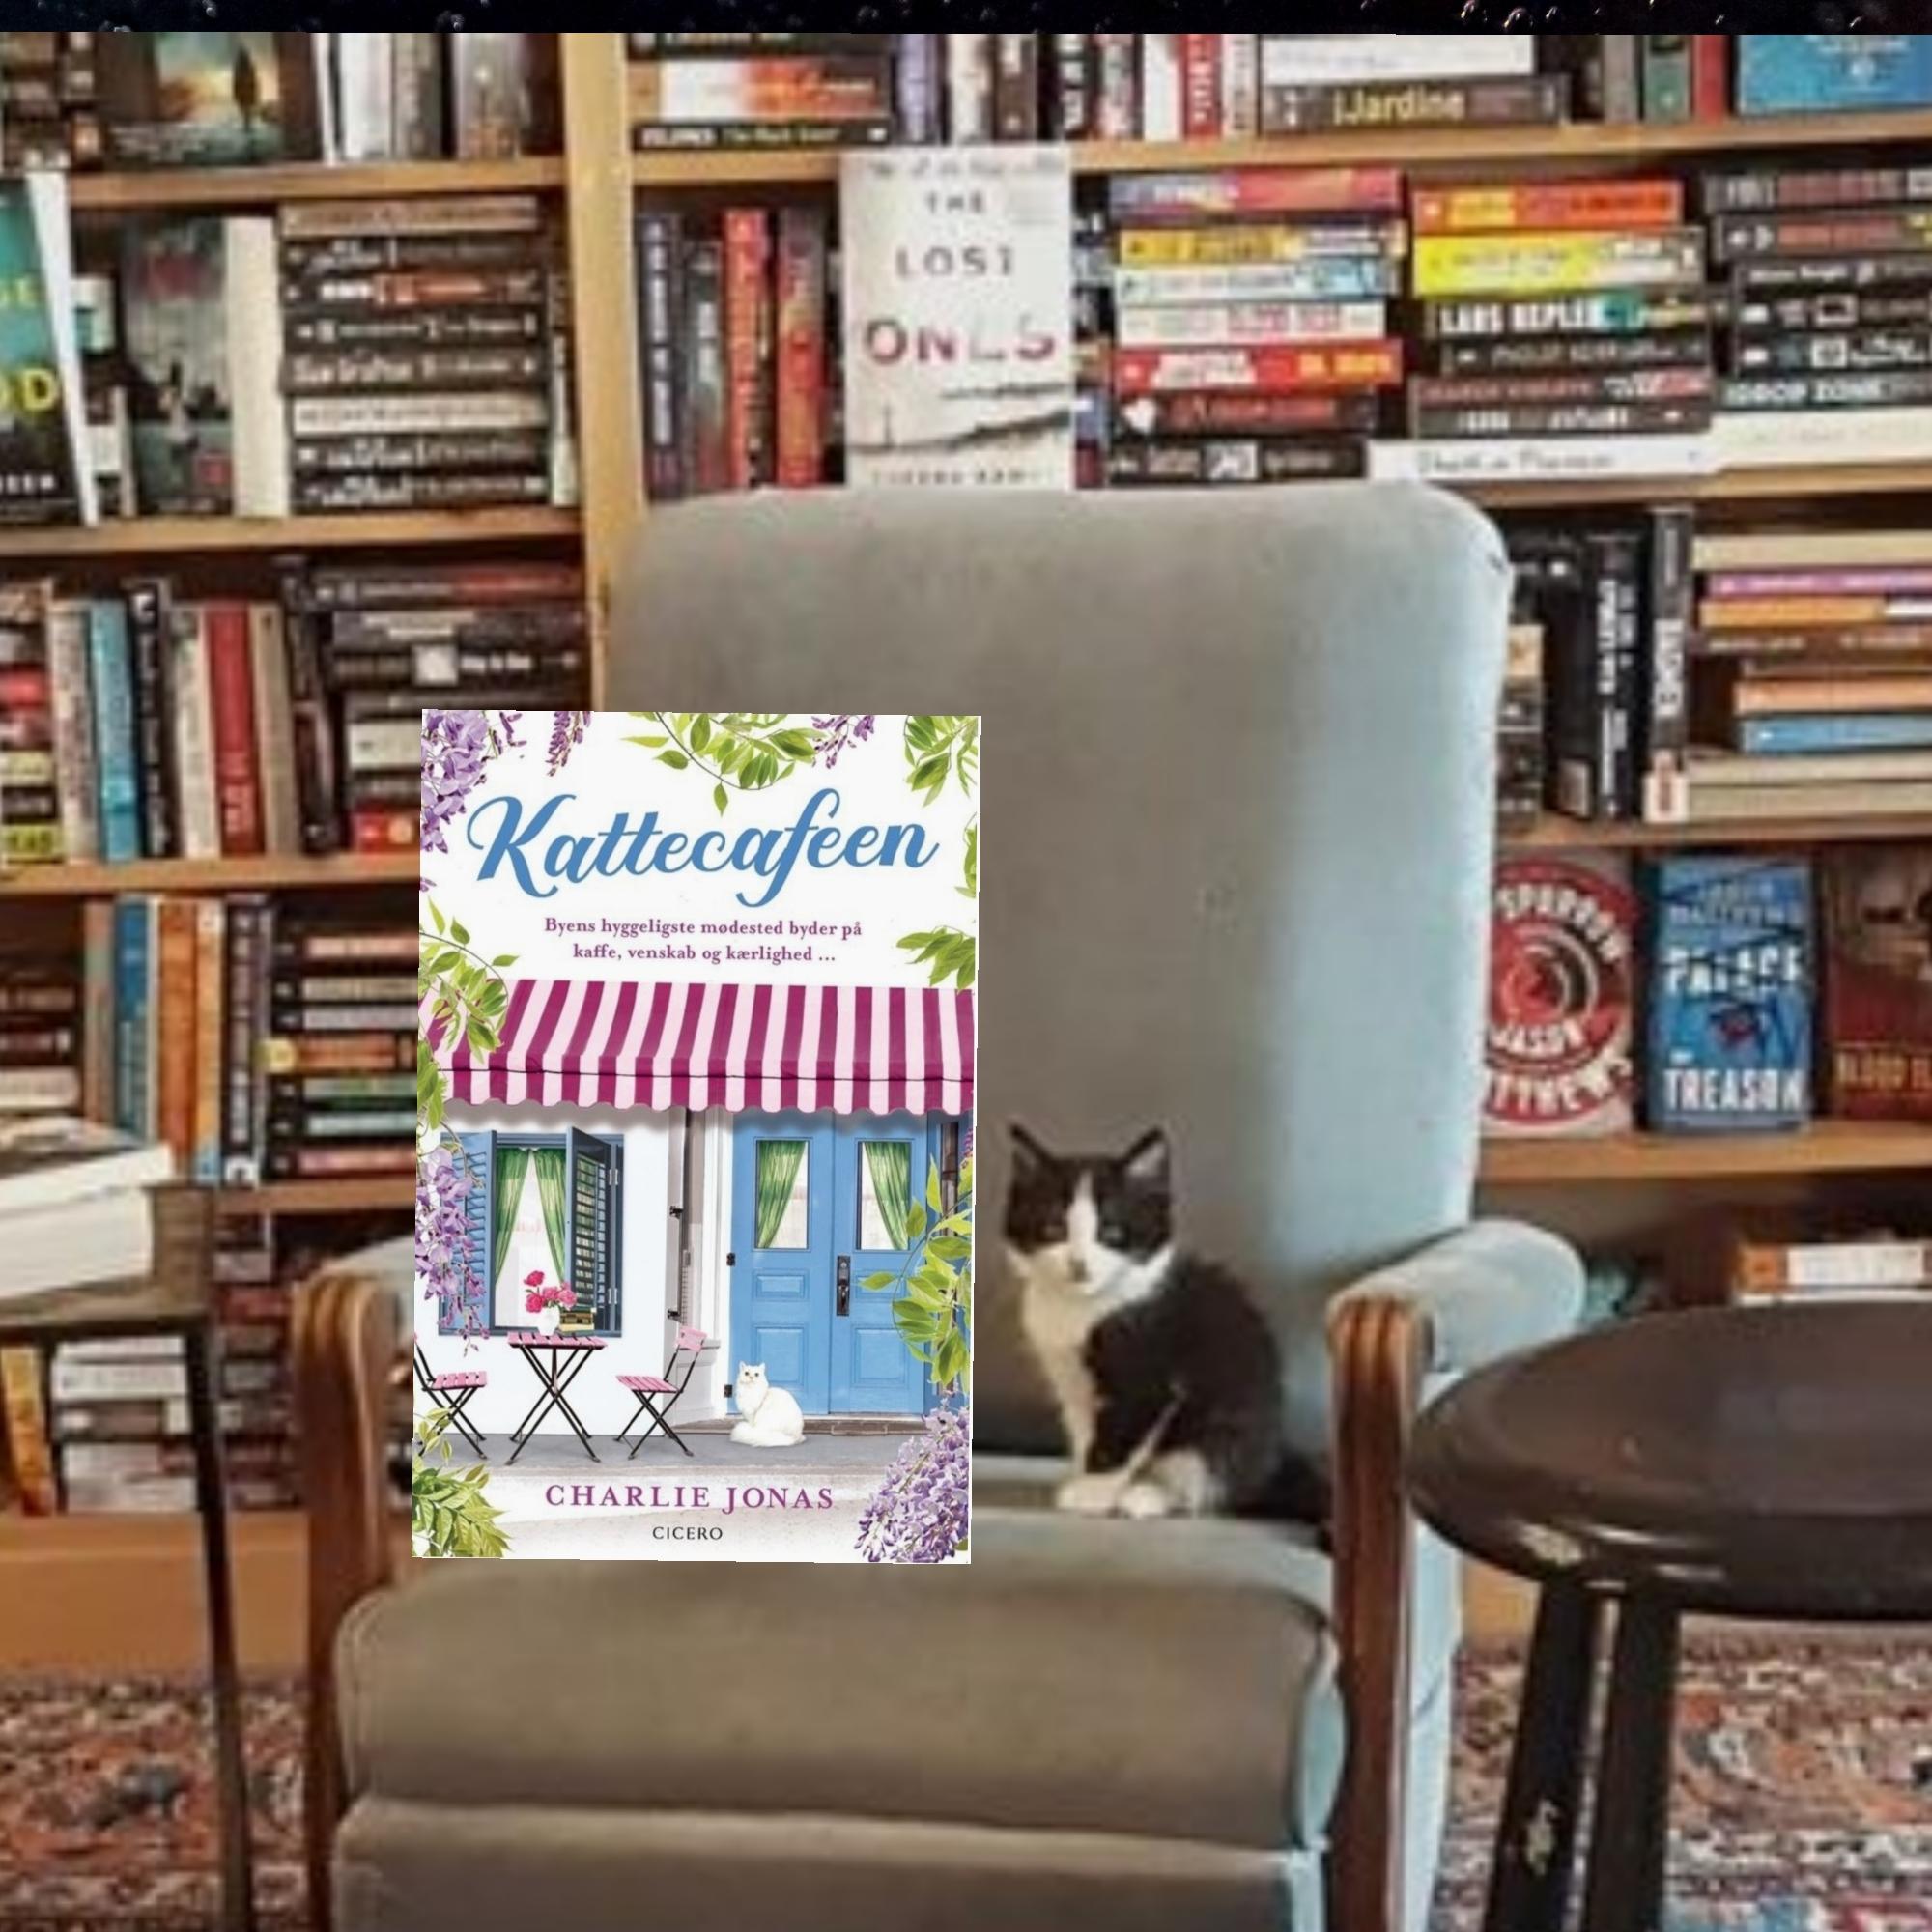 Kattecafeen af Charlie Jonas